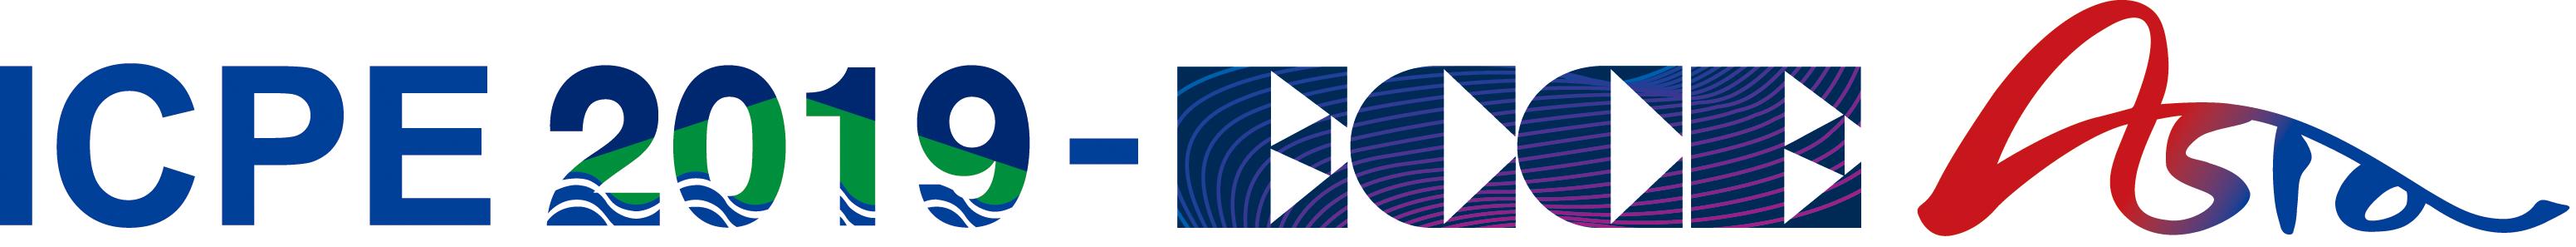 国際会議ICPE 2019 -ECCE Asia-